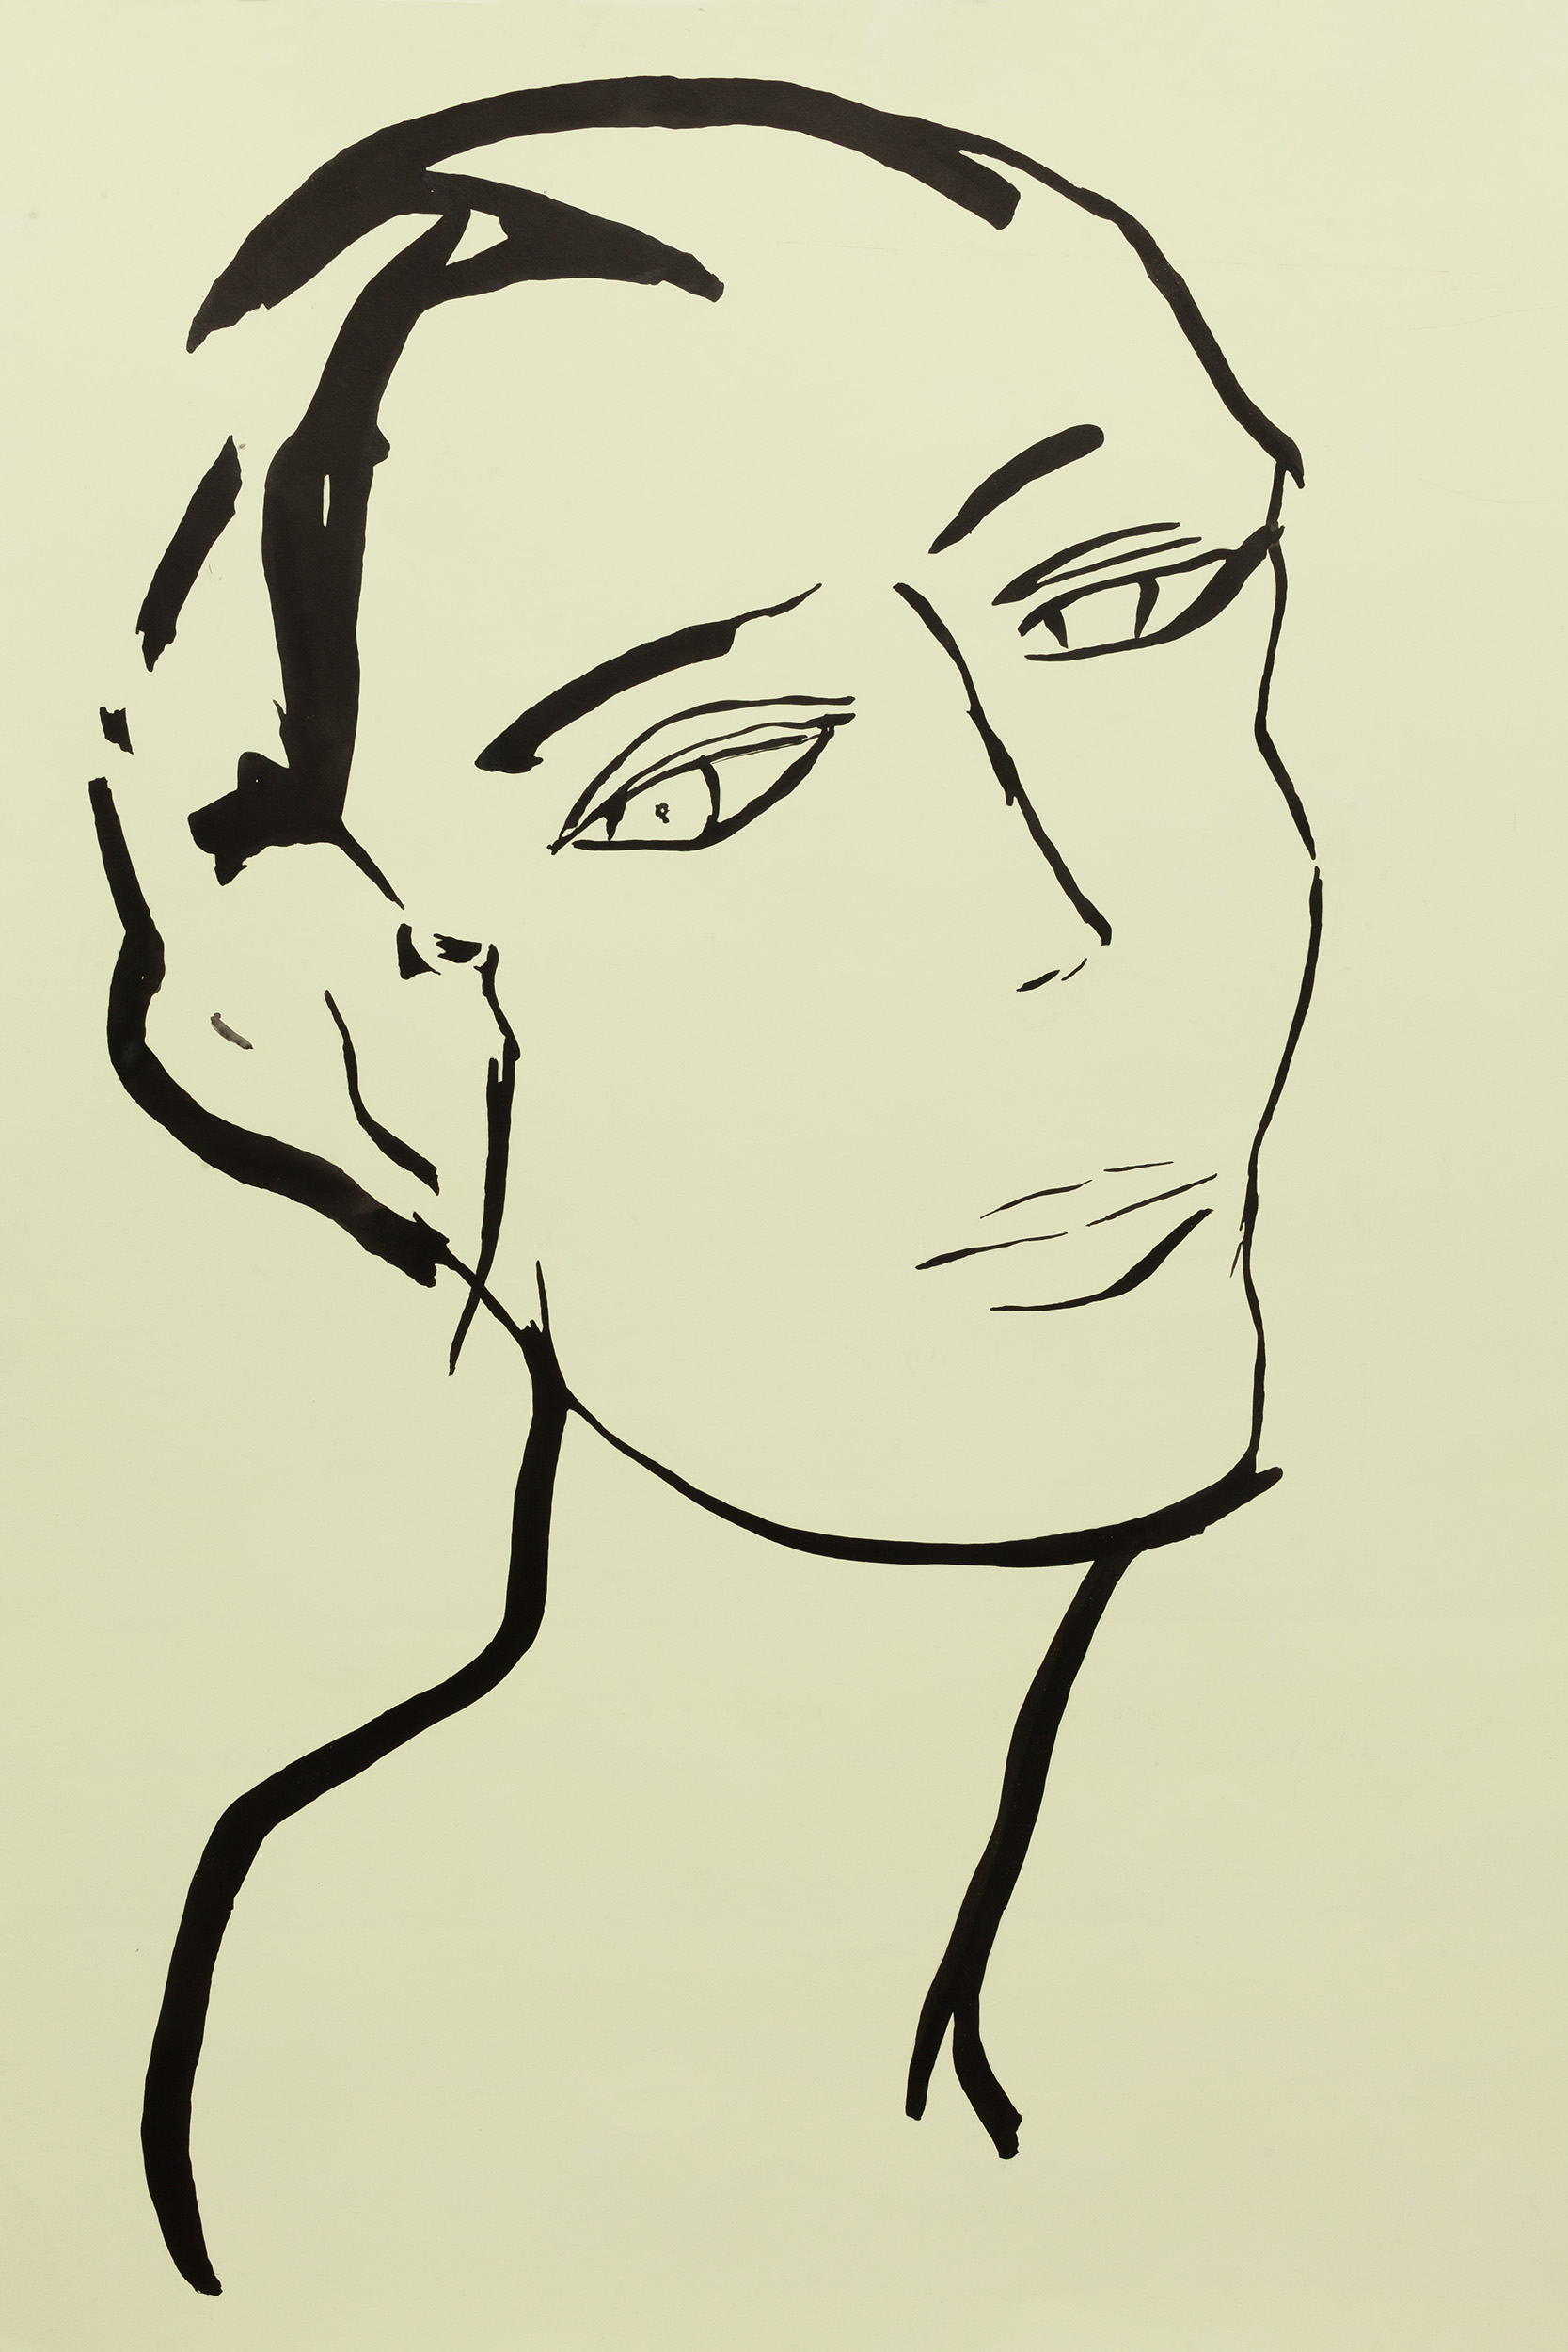 Symbolizing Myself - Cathalijn Wouters Kroon gallery